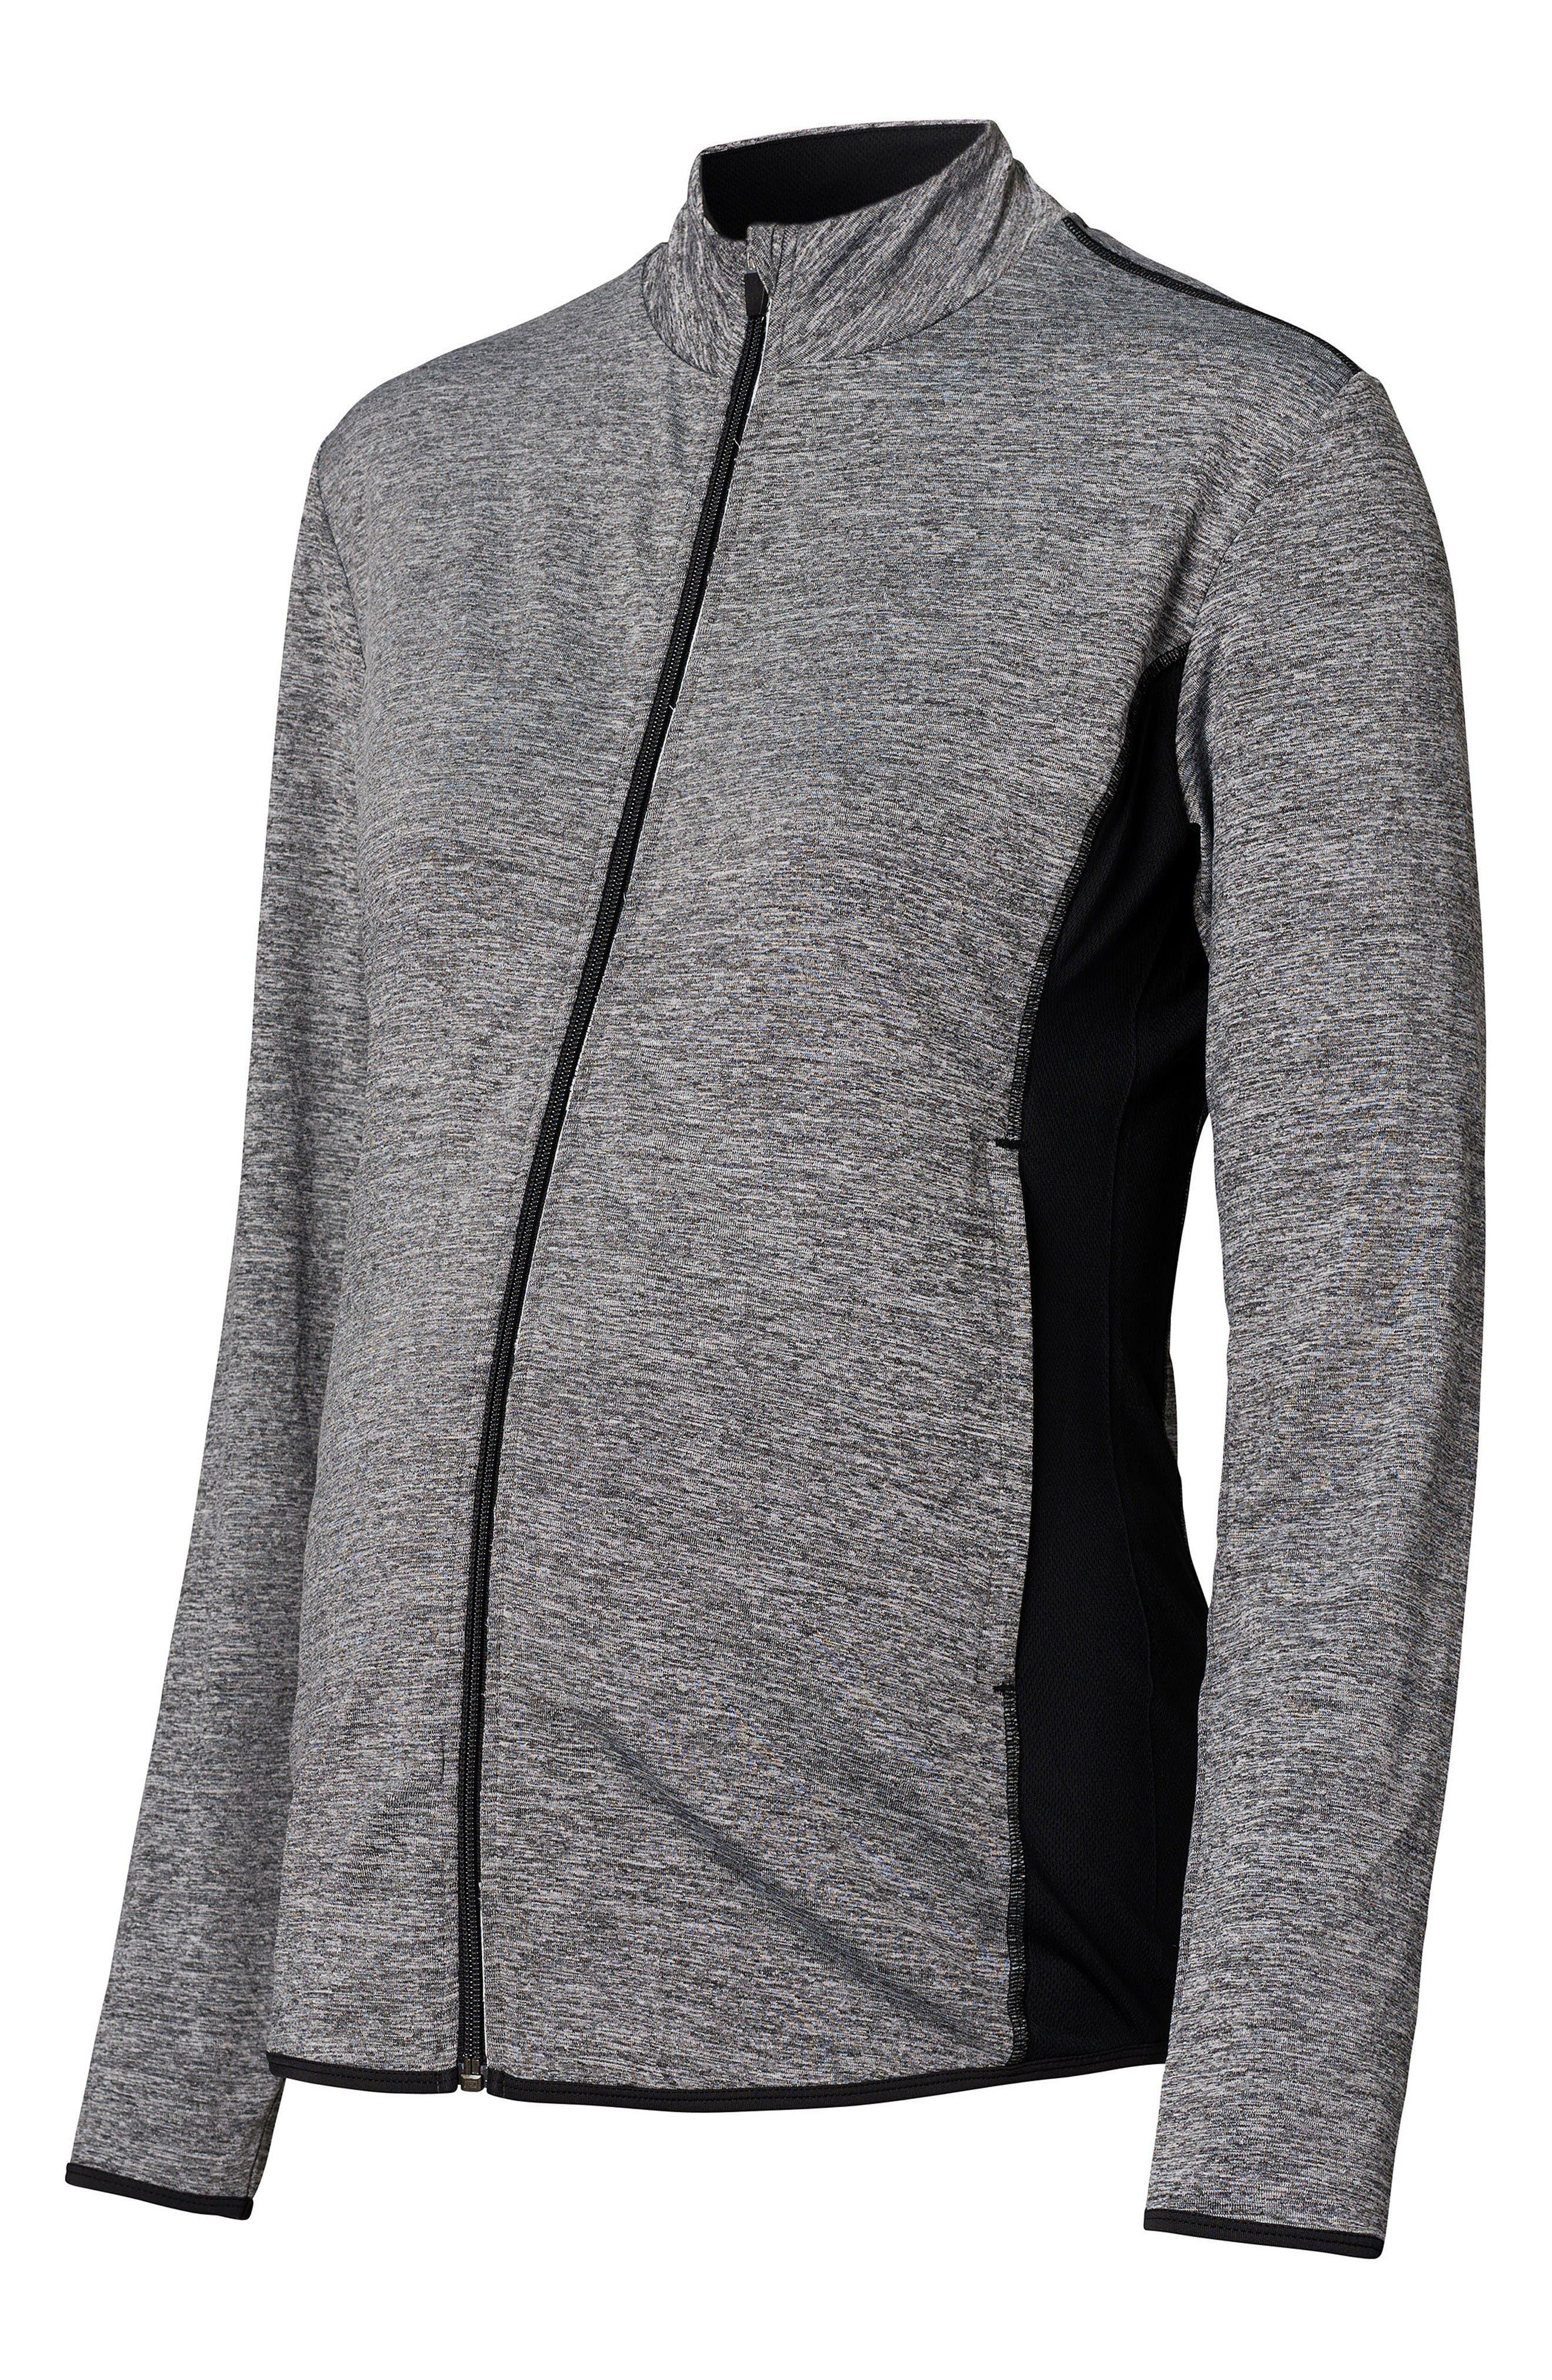 Maternity Jacket,                             Alternate thumbnail 3, color,                             Grey Melange